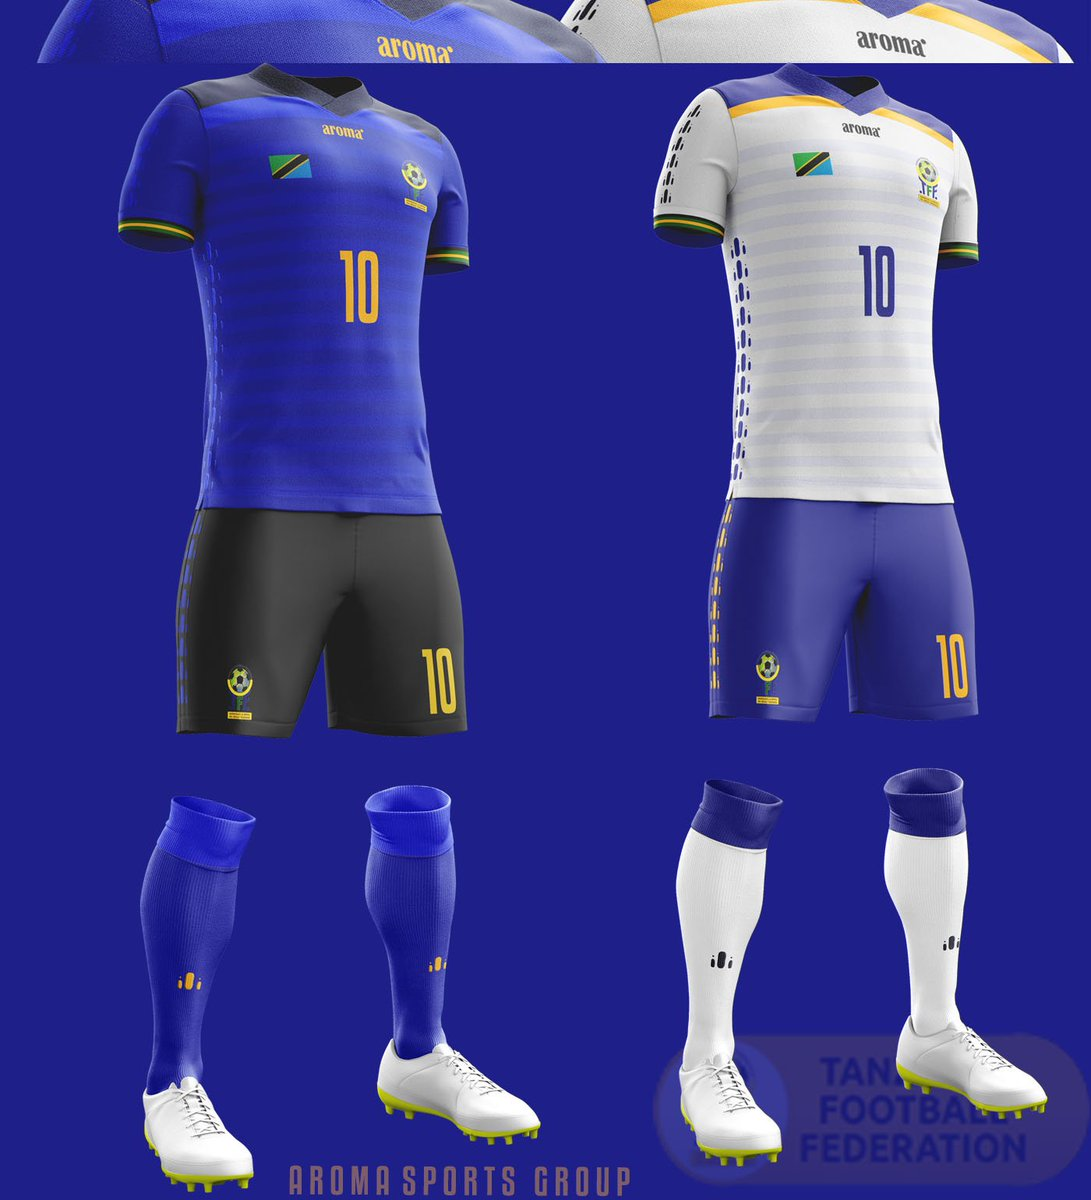 Tanzania&#39;s @TaifaStars_  Concept Kit made by #AromaSports #JivikeUjasiri  #Tanzania. <br>http://pic.twitter.com/H7lzrRhLUm